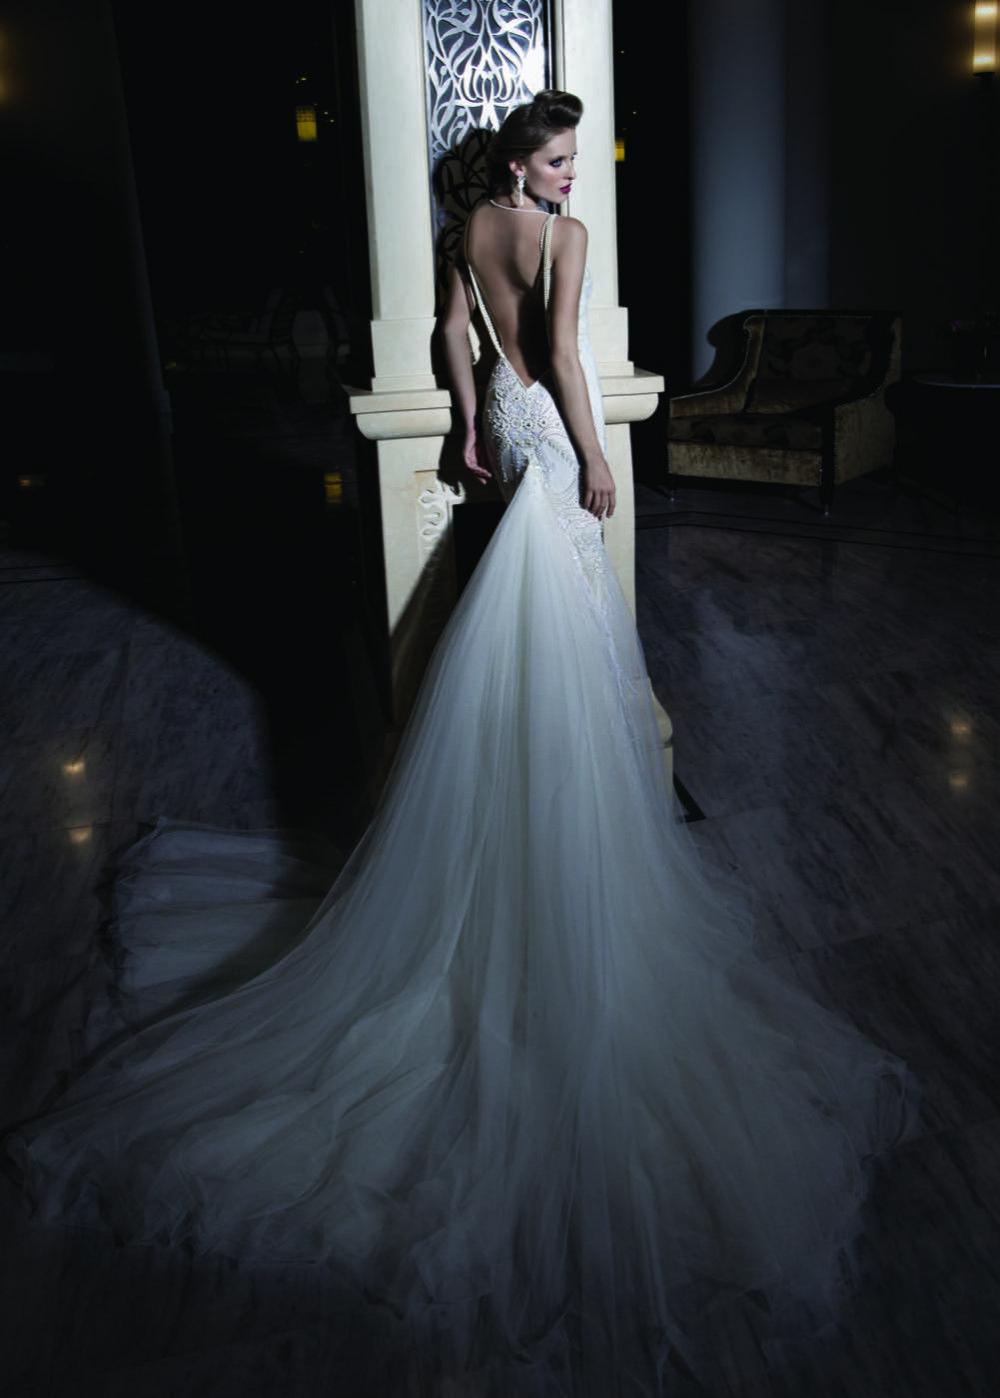 Blog OMG - I'm Engaged! - Vestidos de Noiva Galia Lahav. Vintage wedding dress.